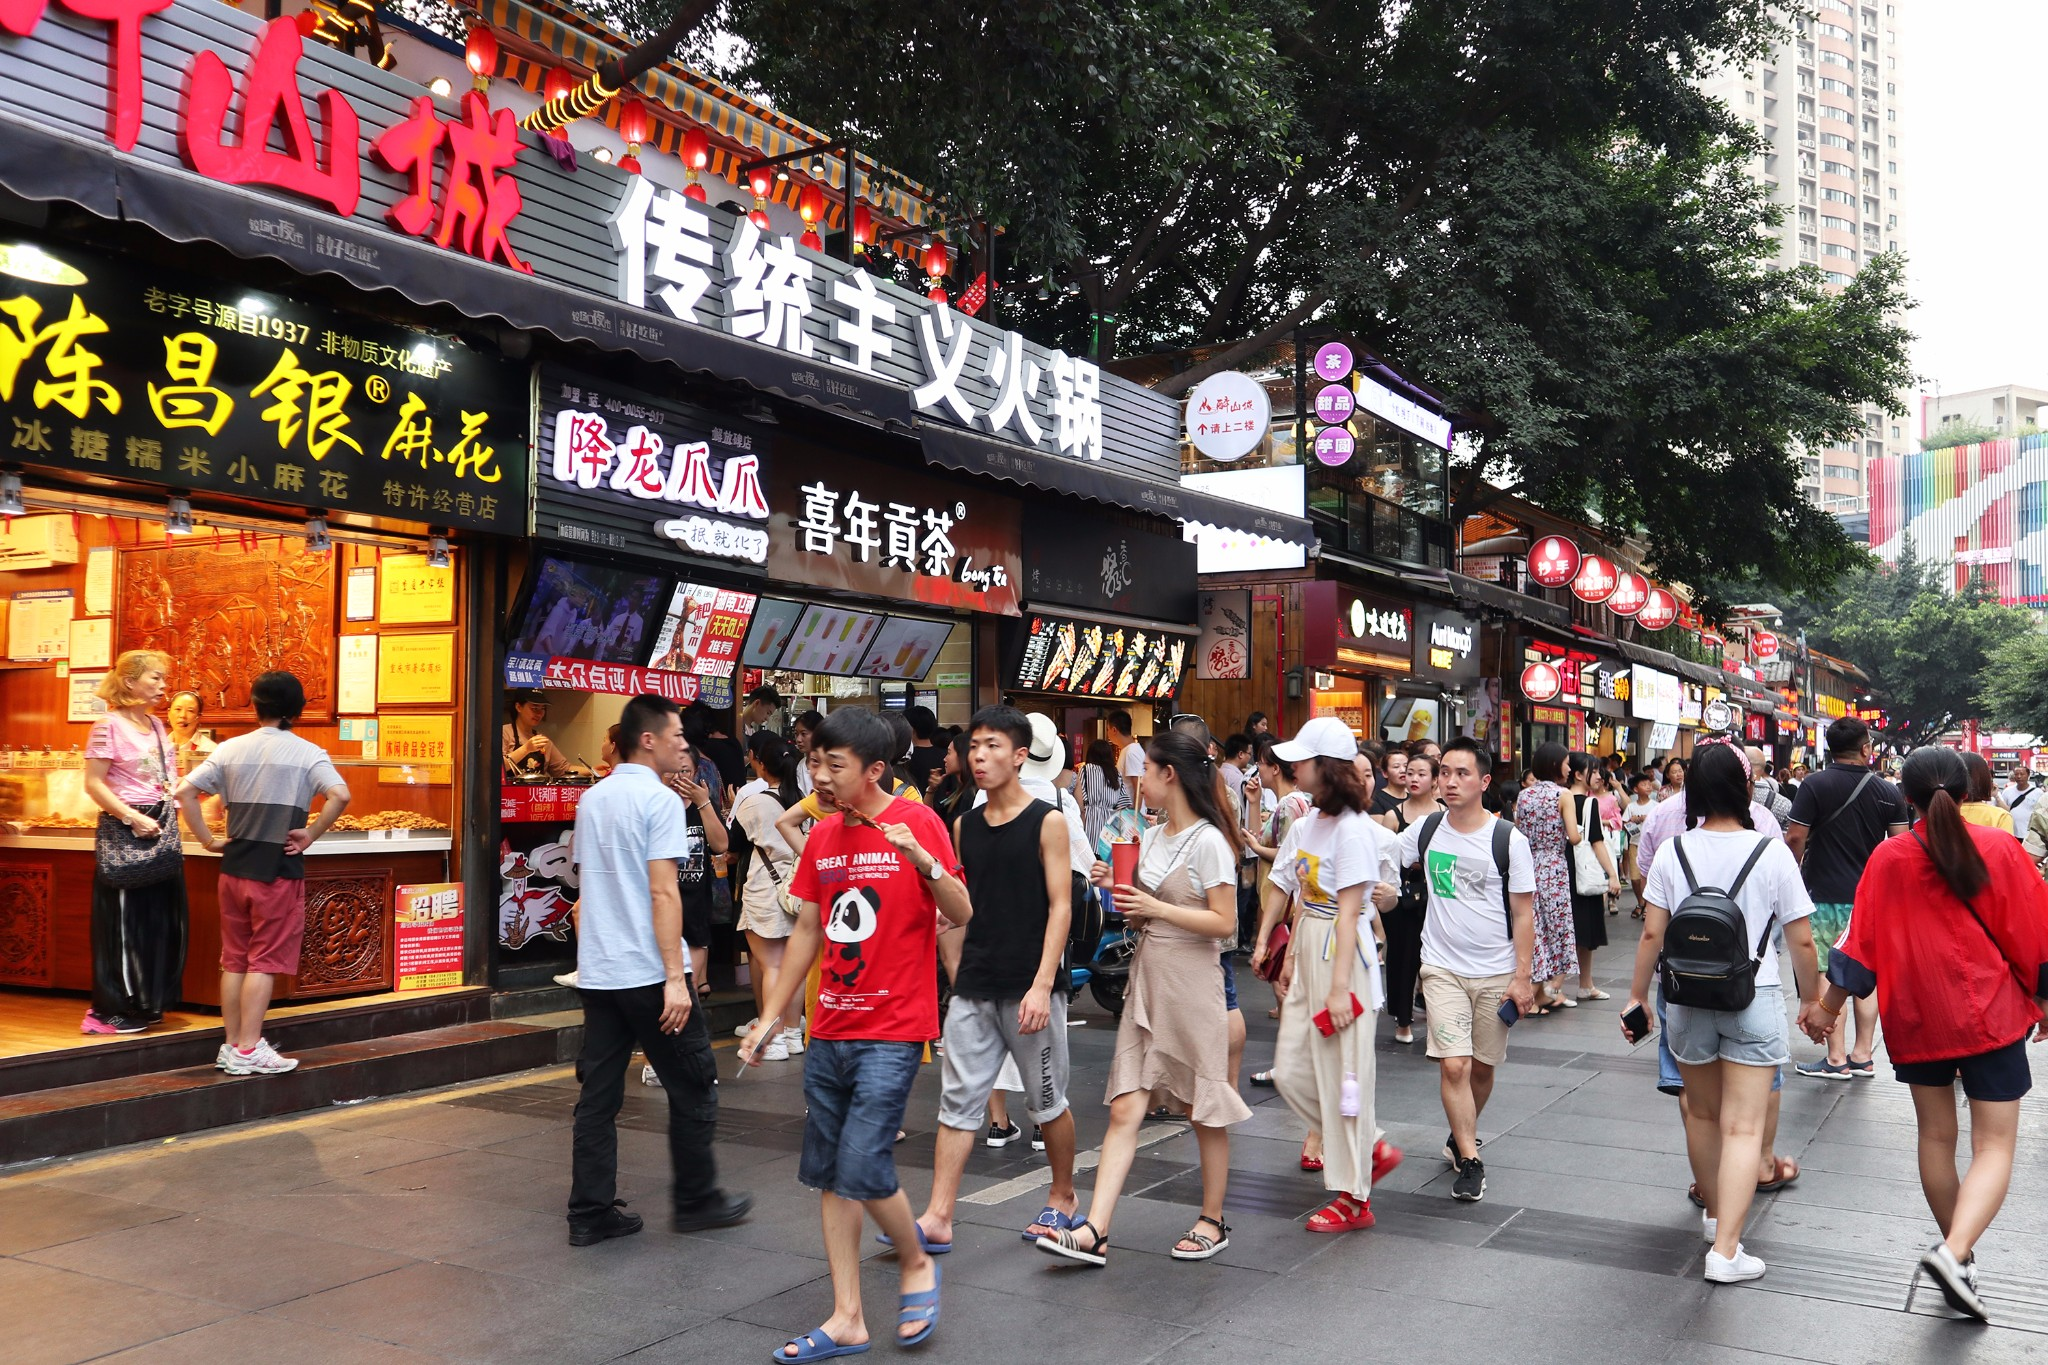 chongqing food street